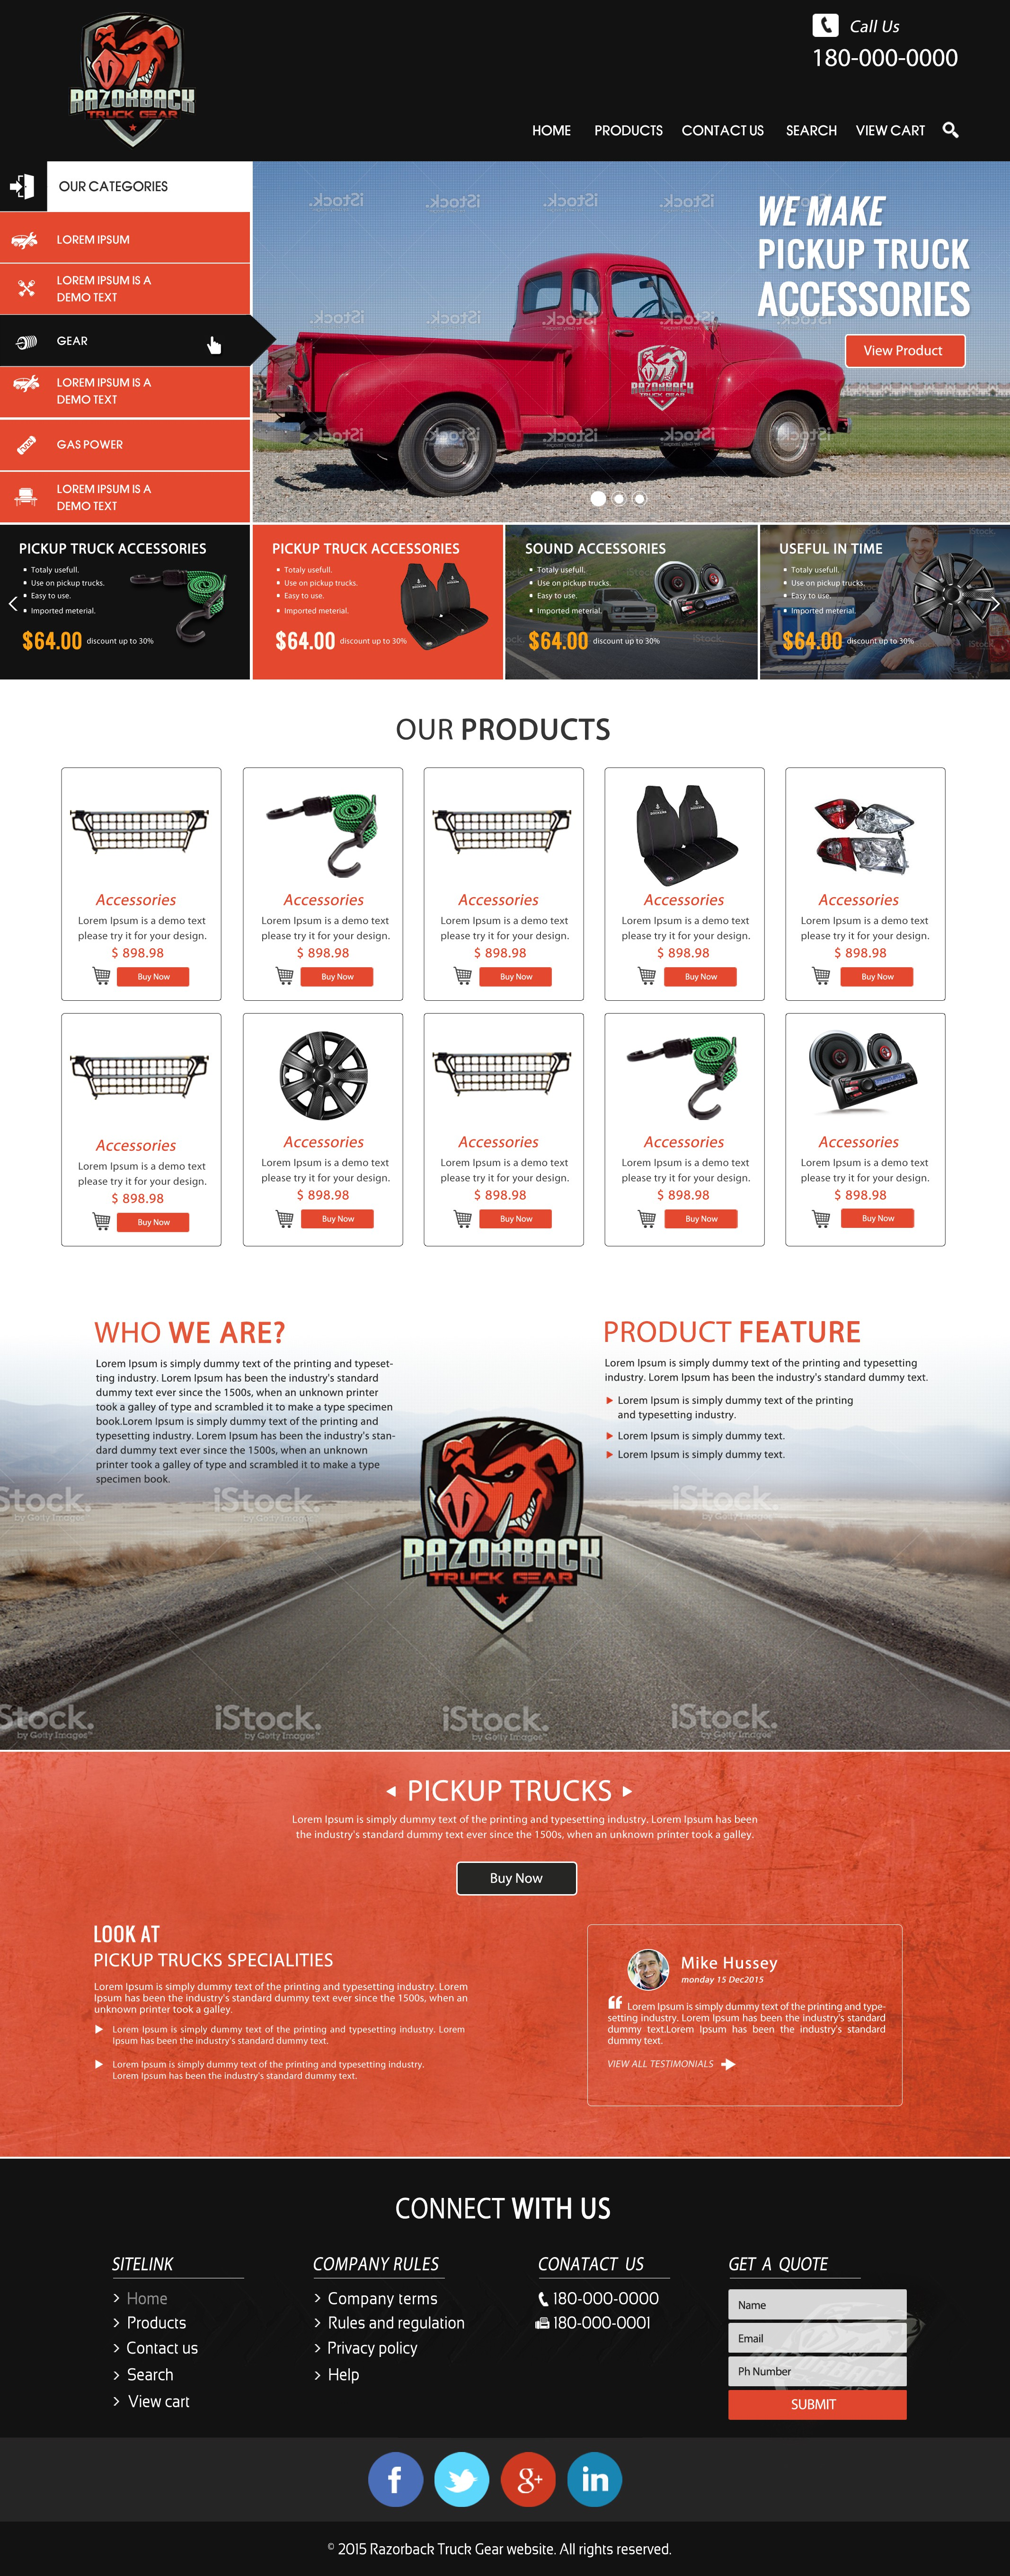 Create an amazing web presence for Razorback Truck Gear.